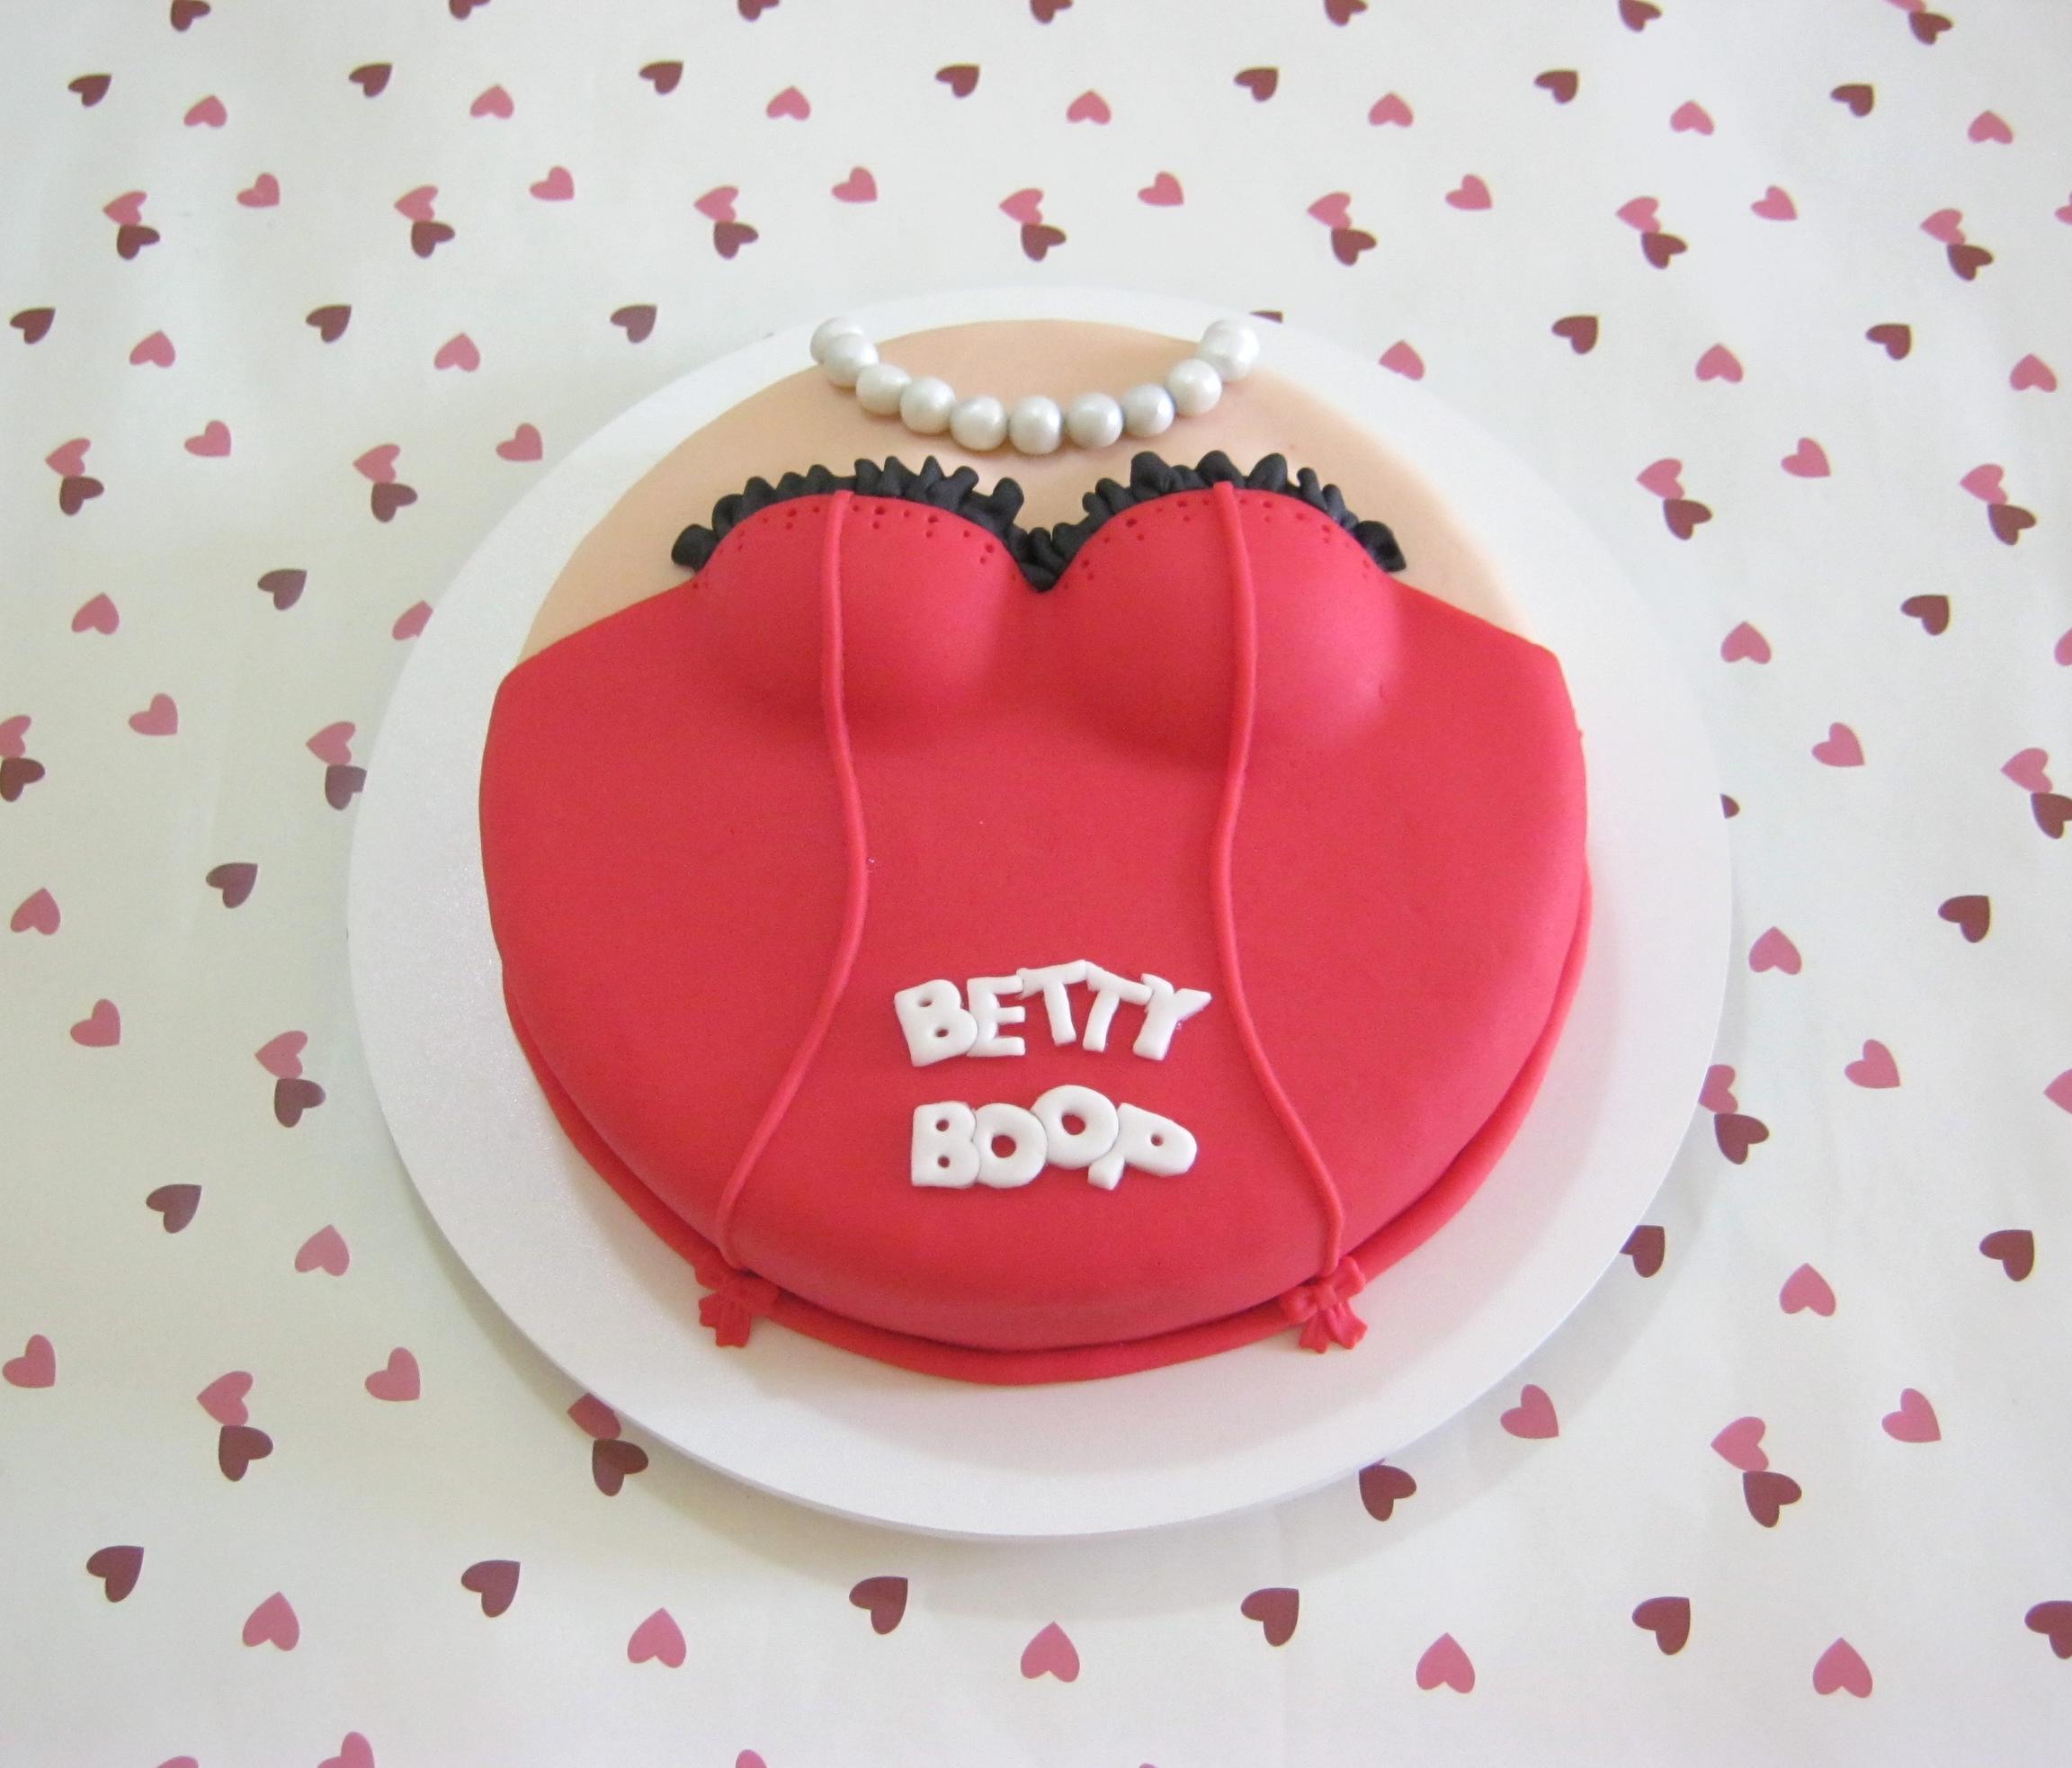 Betty Boop Sonho Doce